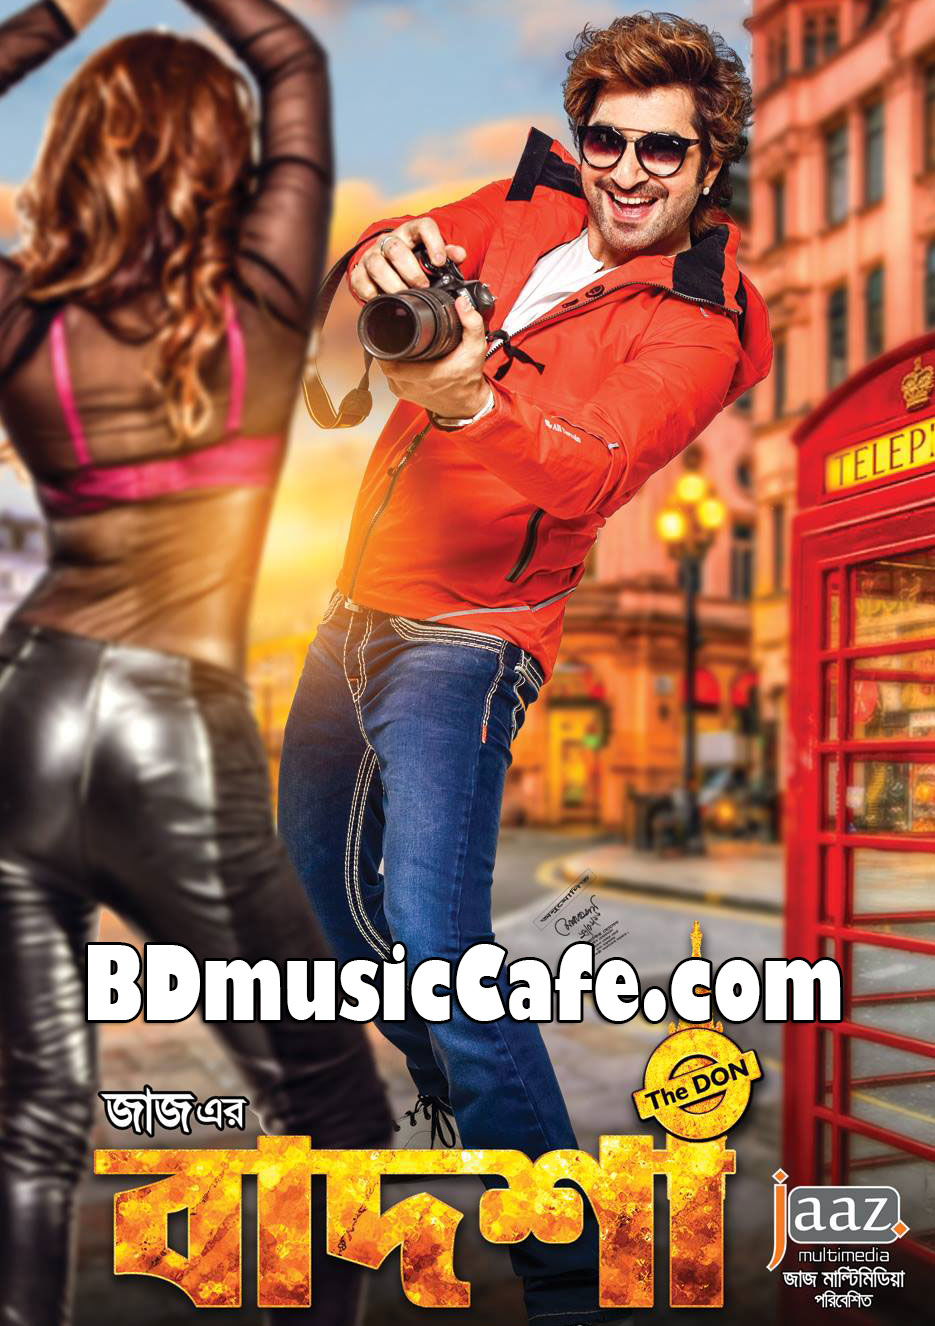 badsha - the don (2016) full hd bengali movie free download